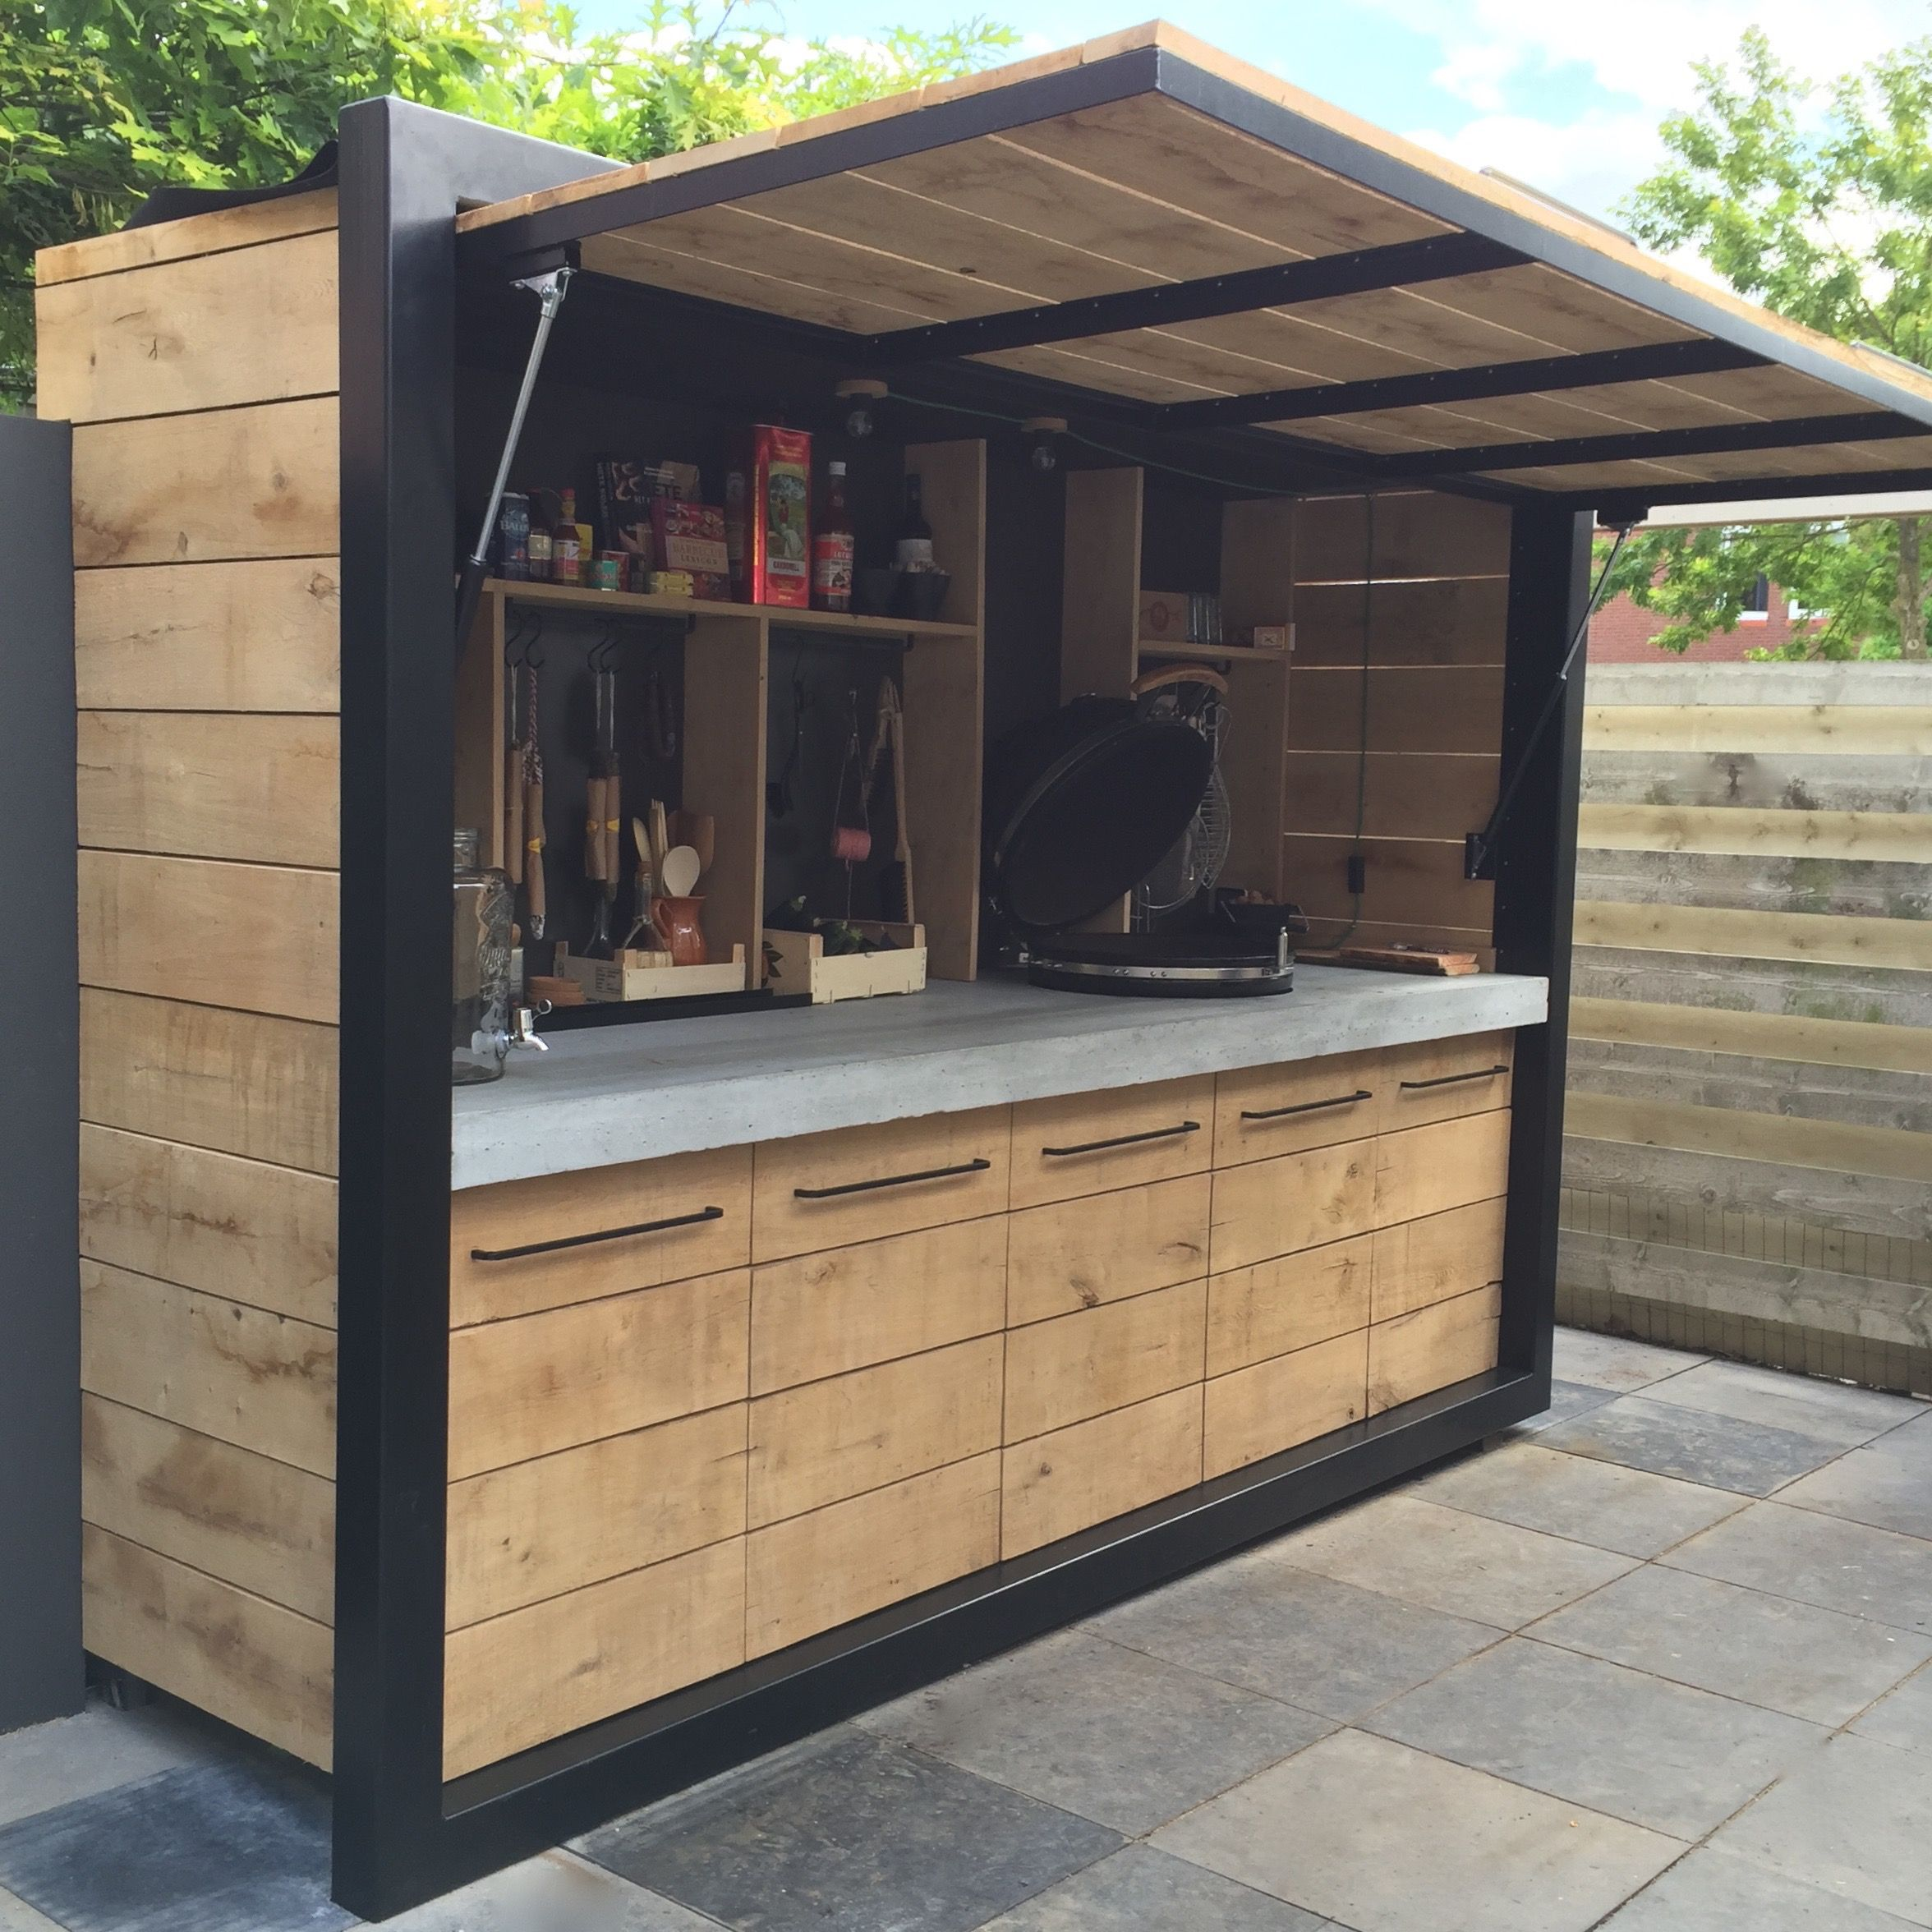 Outdoor Kitchen Ideas For Camping: Buitenkeuken; Eikenhout, Beton En Staal. Ontwerp; Www